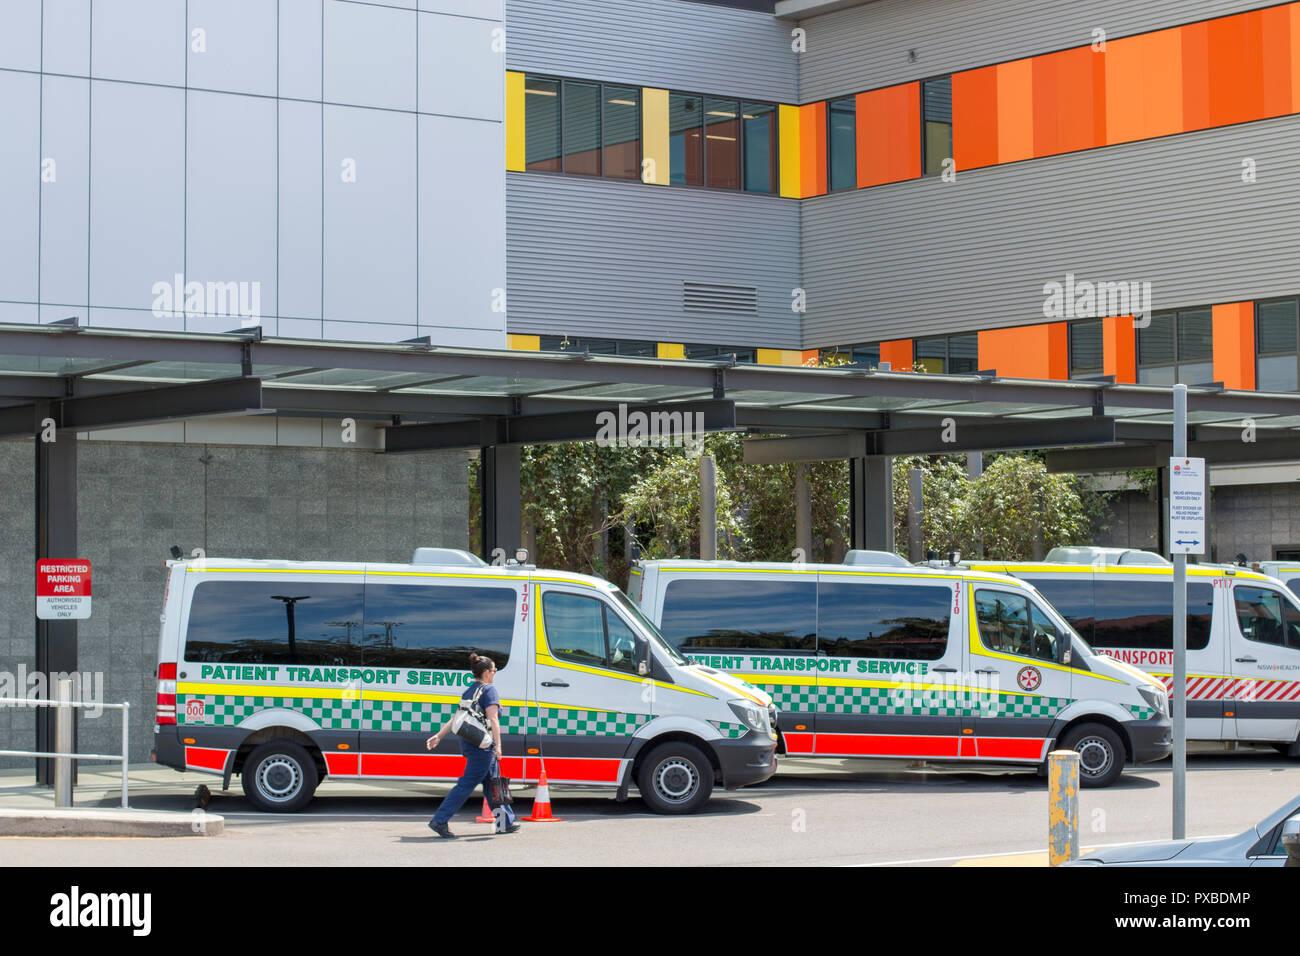 Ambulance vehicles at Royal North Shore Hospital in Sydney,Australia - Stock Image